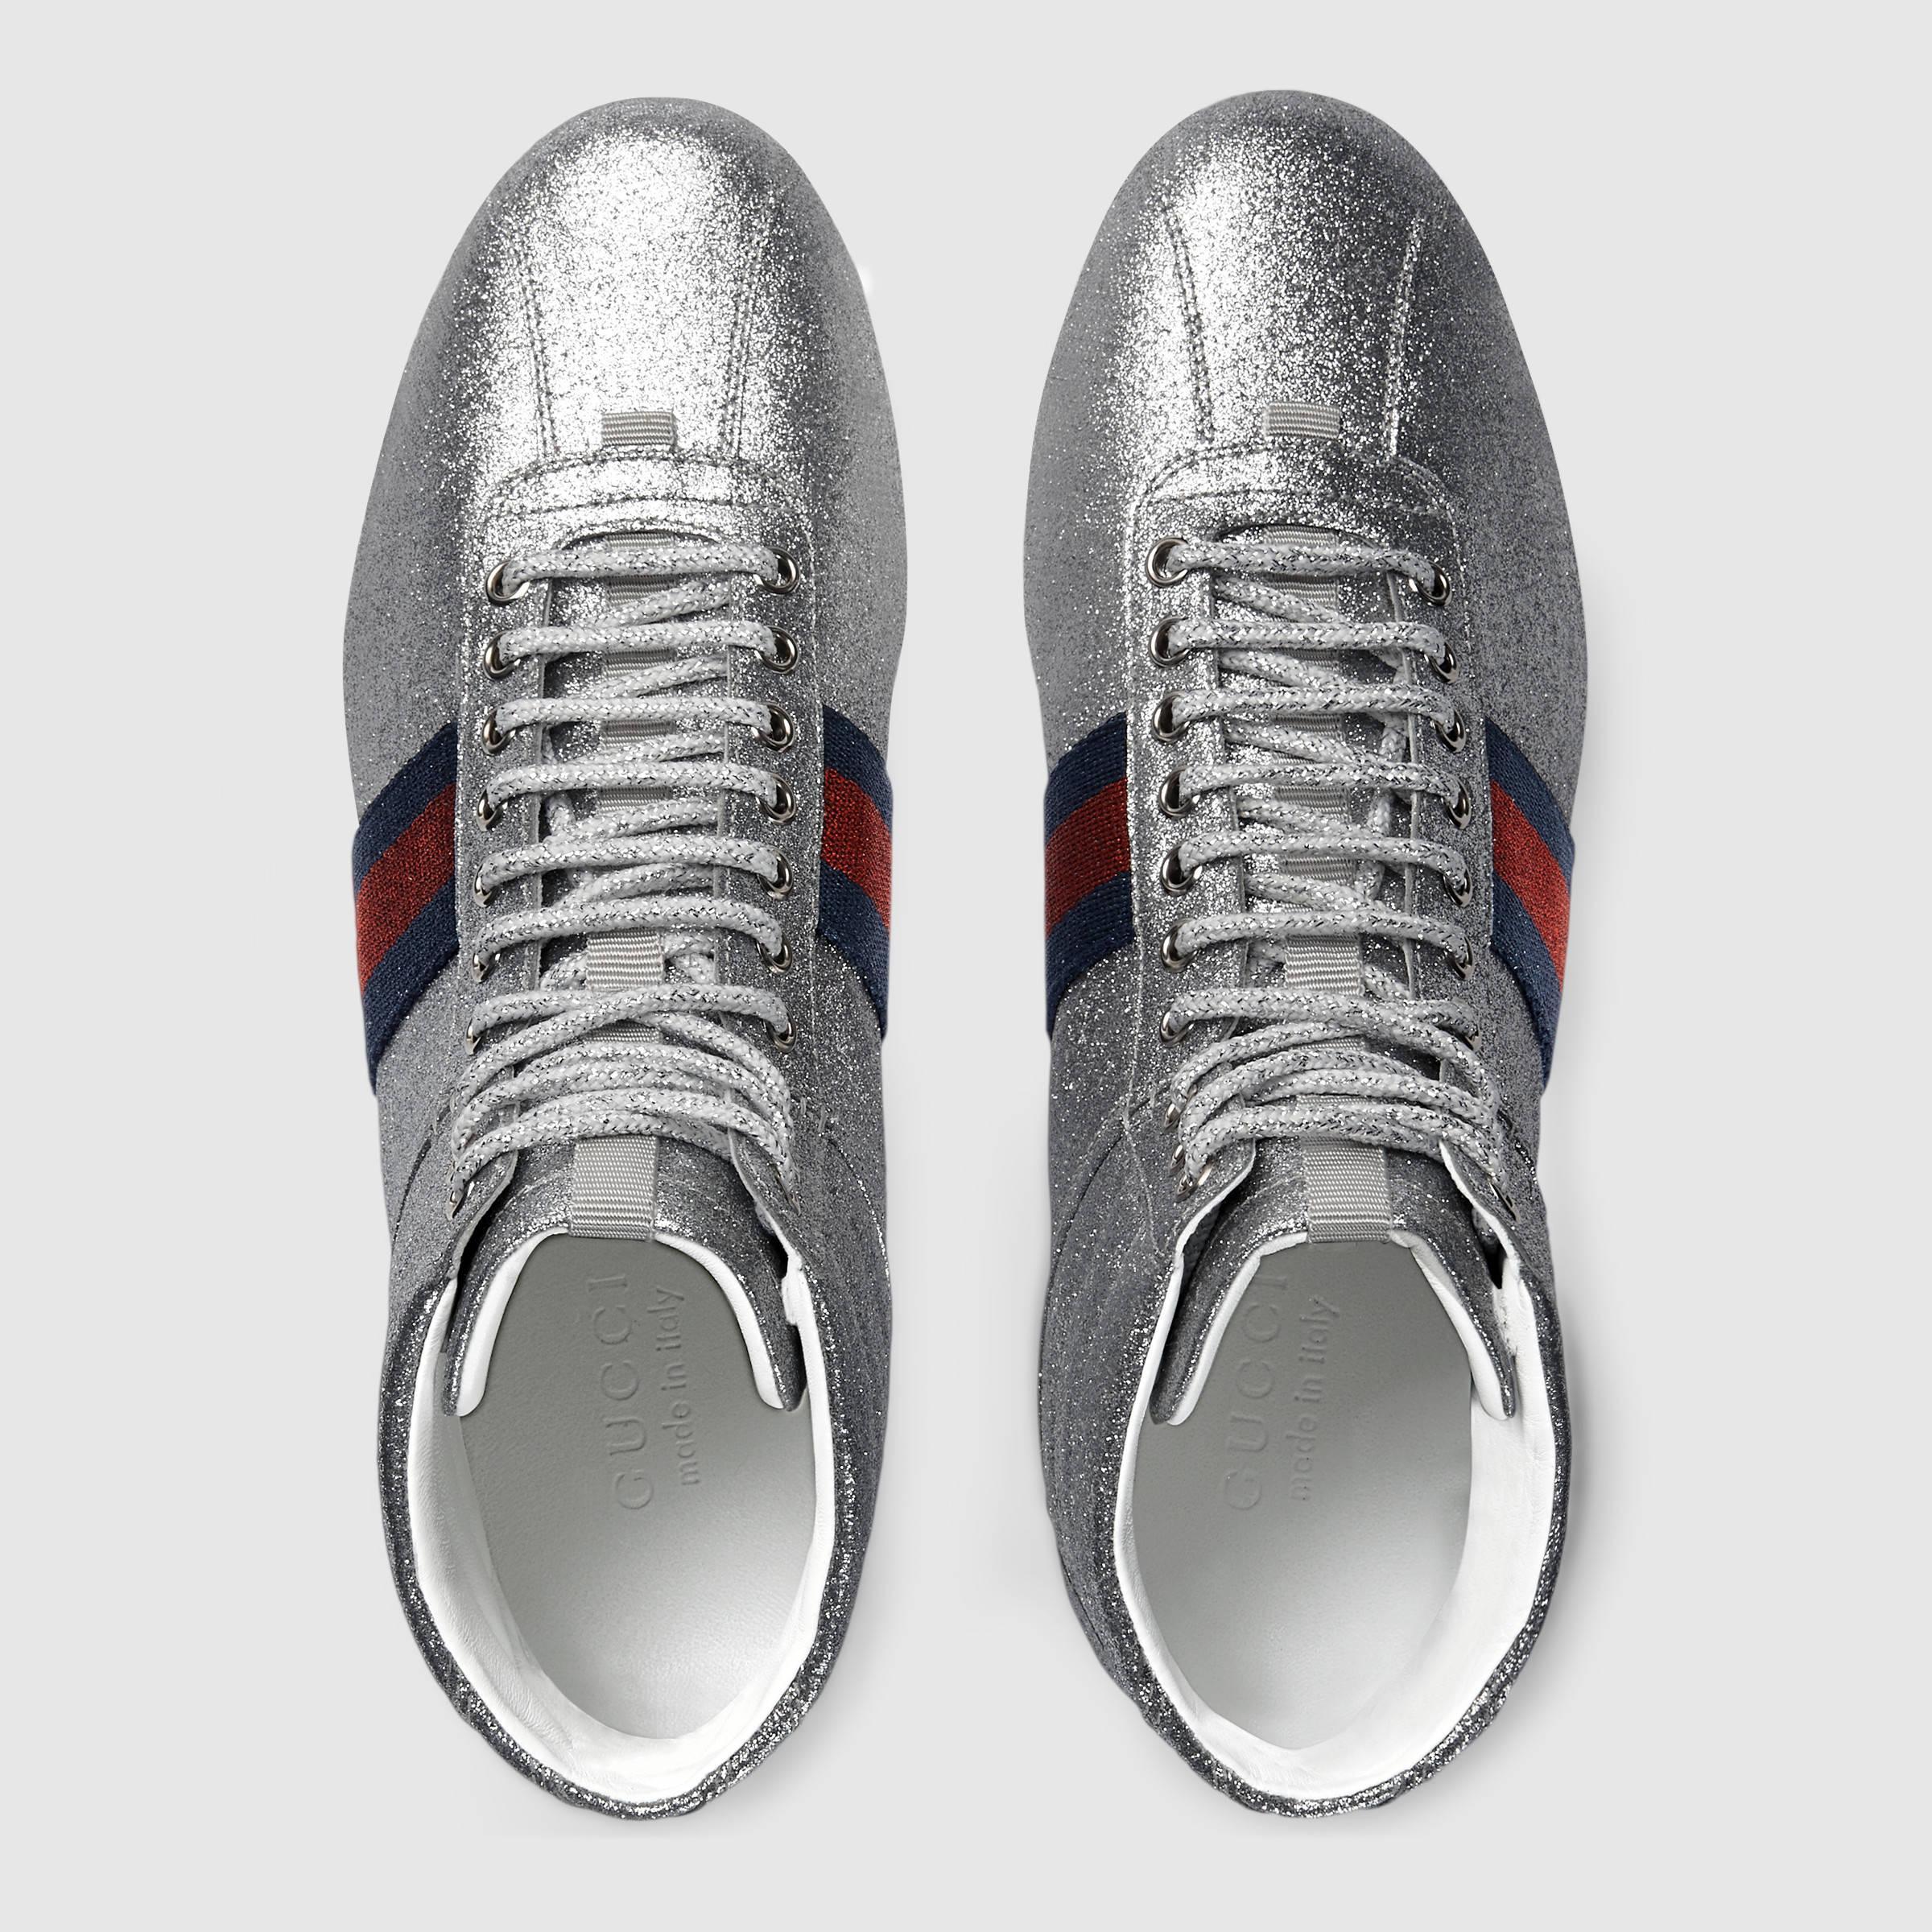 1995e6ade51 Lyst - Gucci Glitter Web High-top Sneaker in Metallic for Men